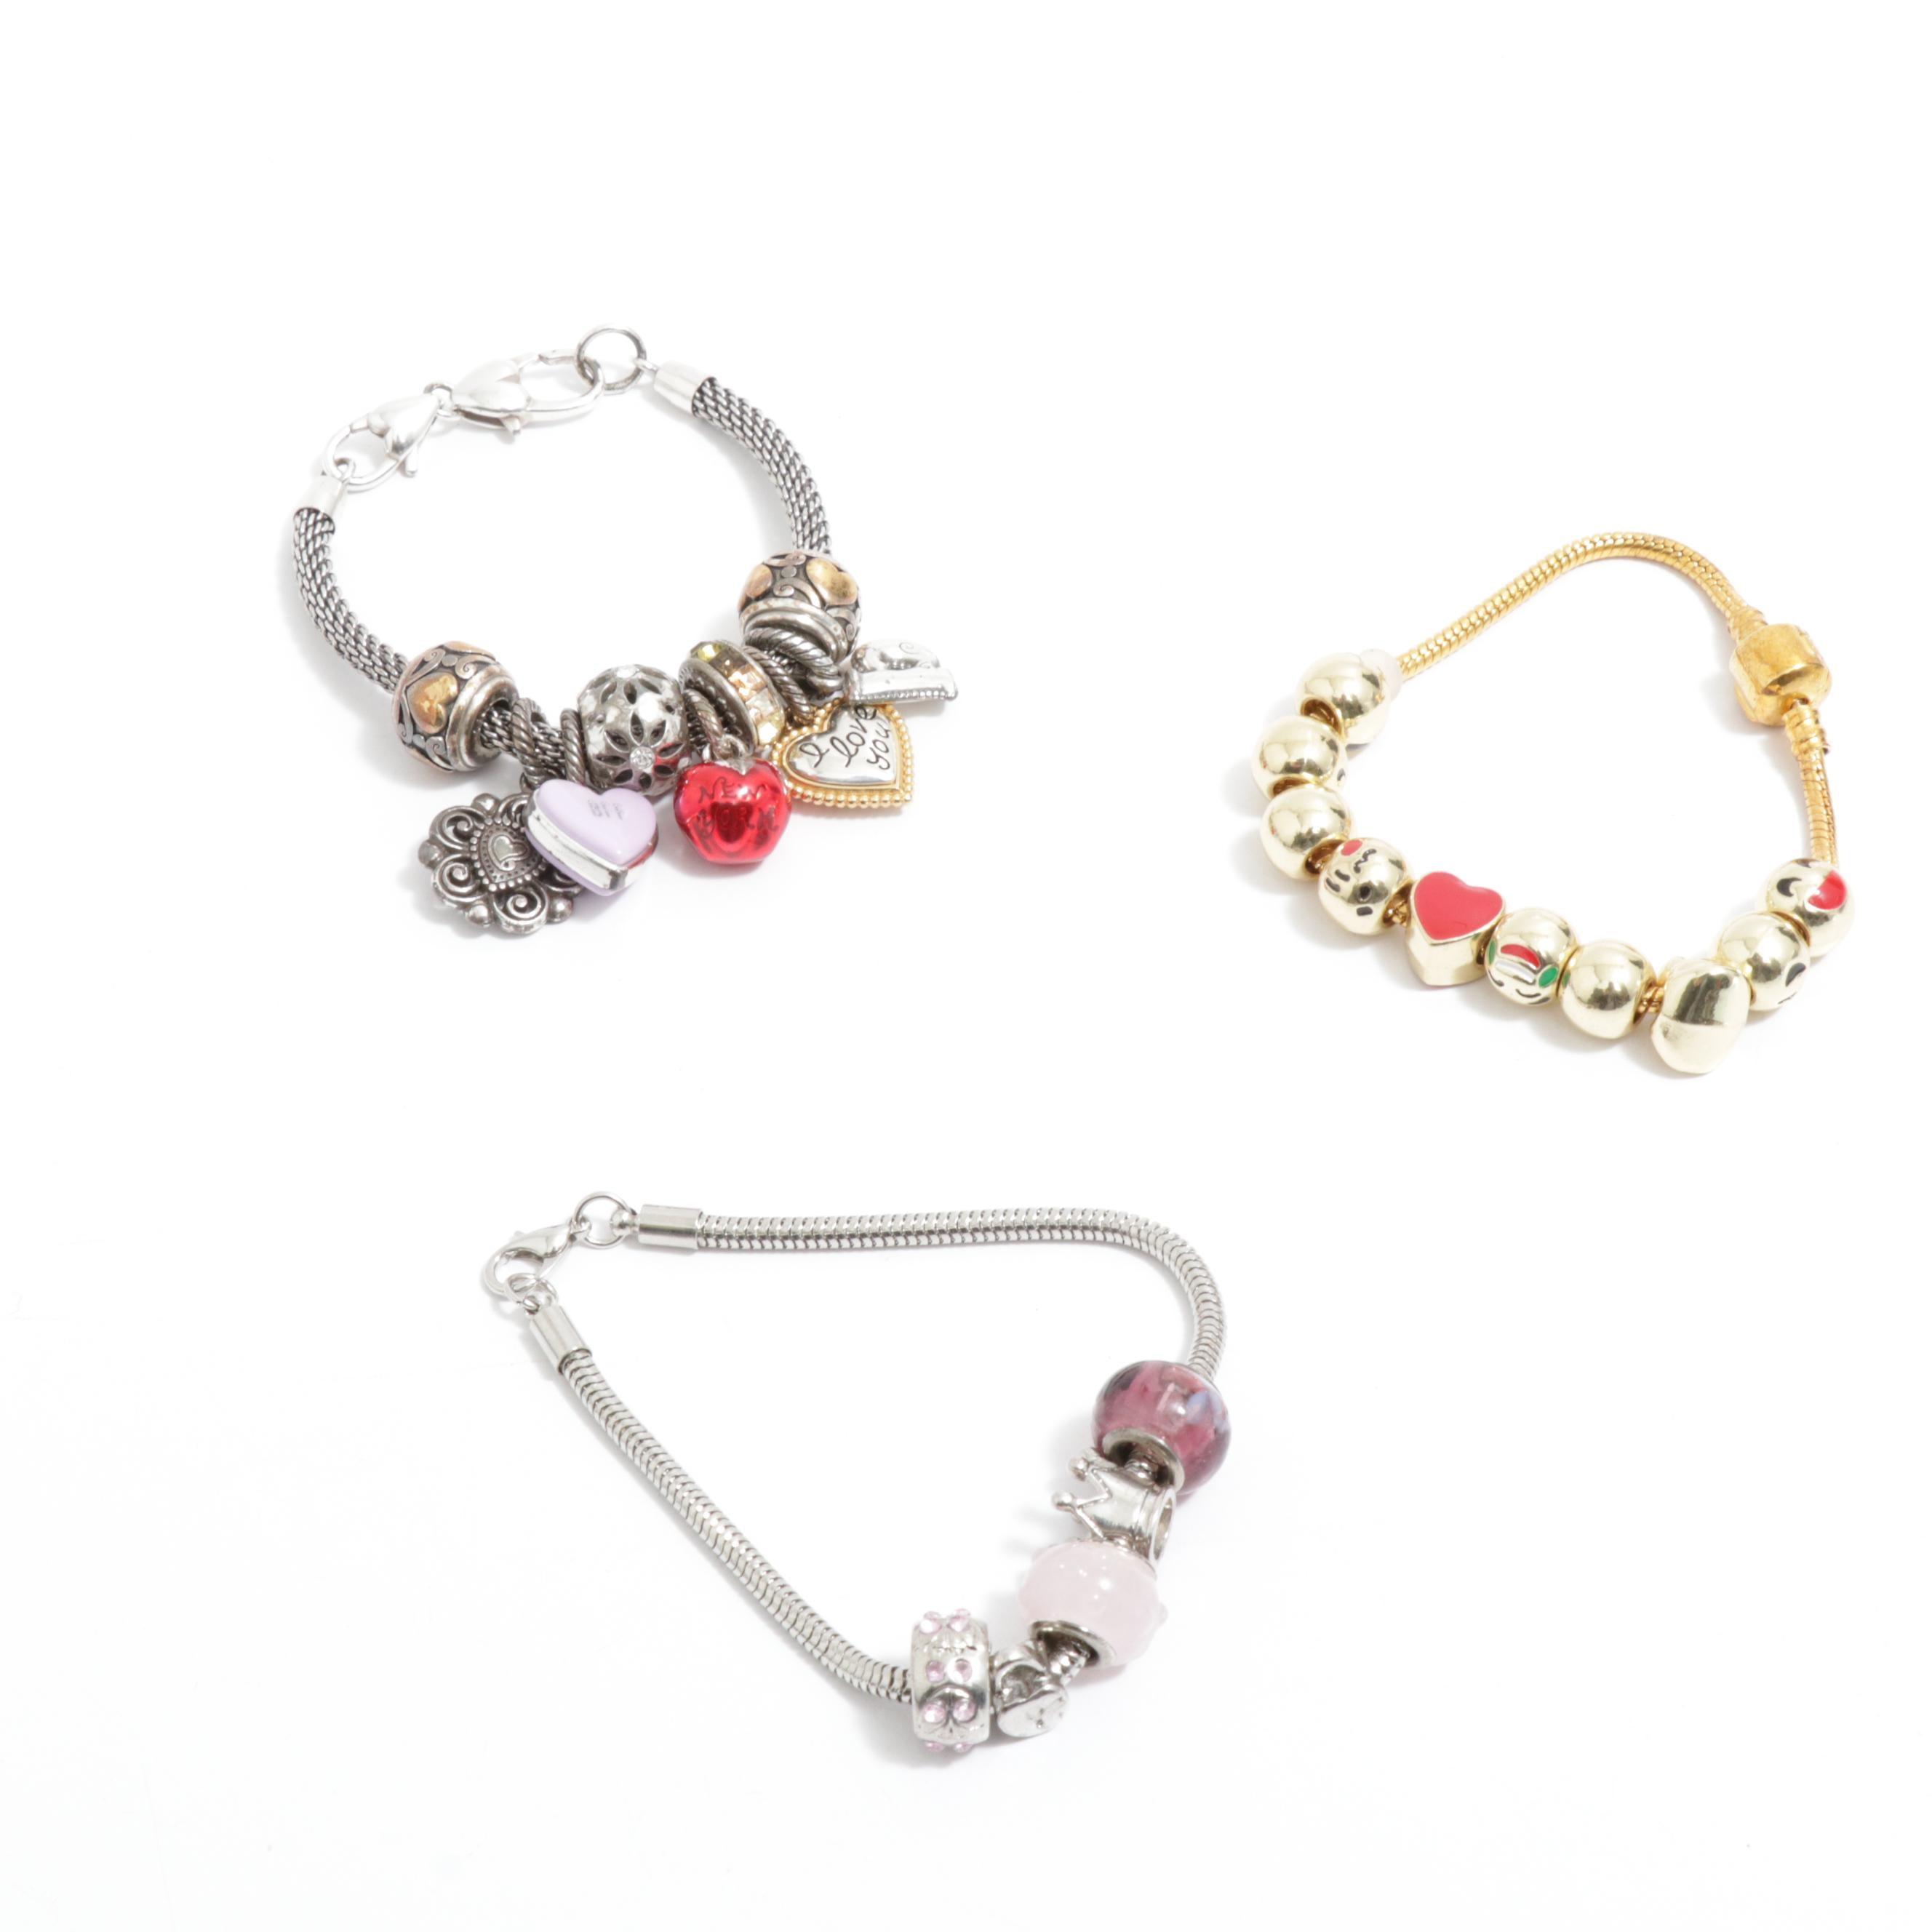 Beaded Charm Bracelets including Manbara